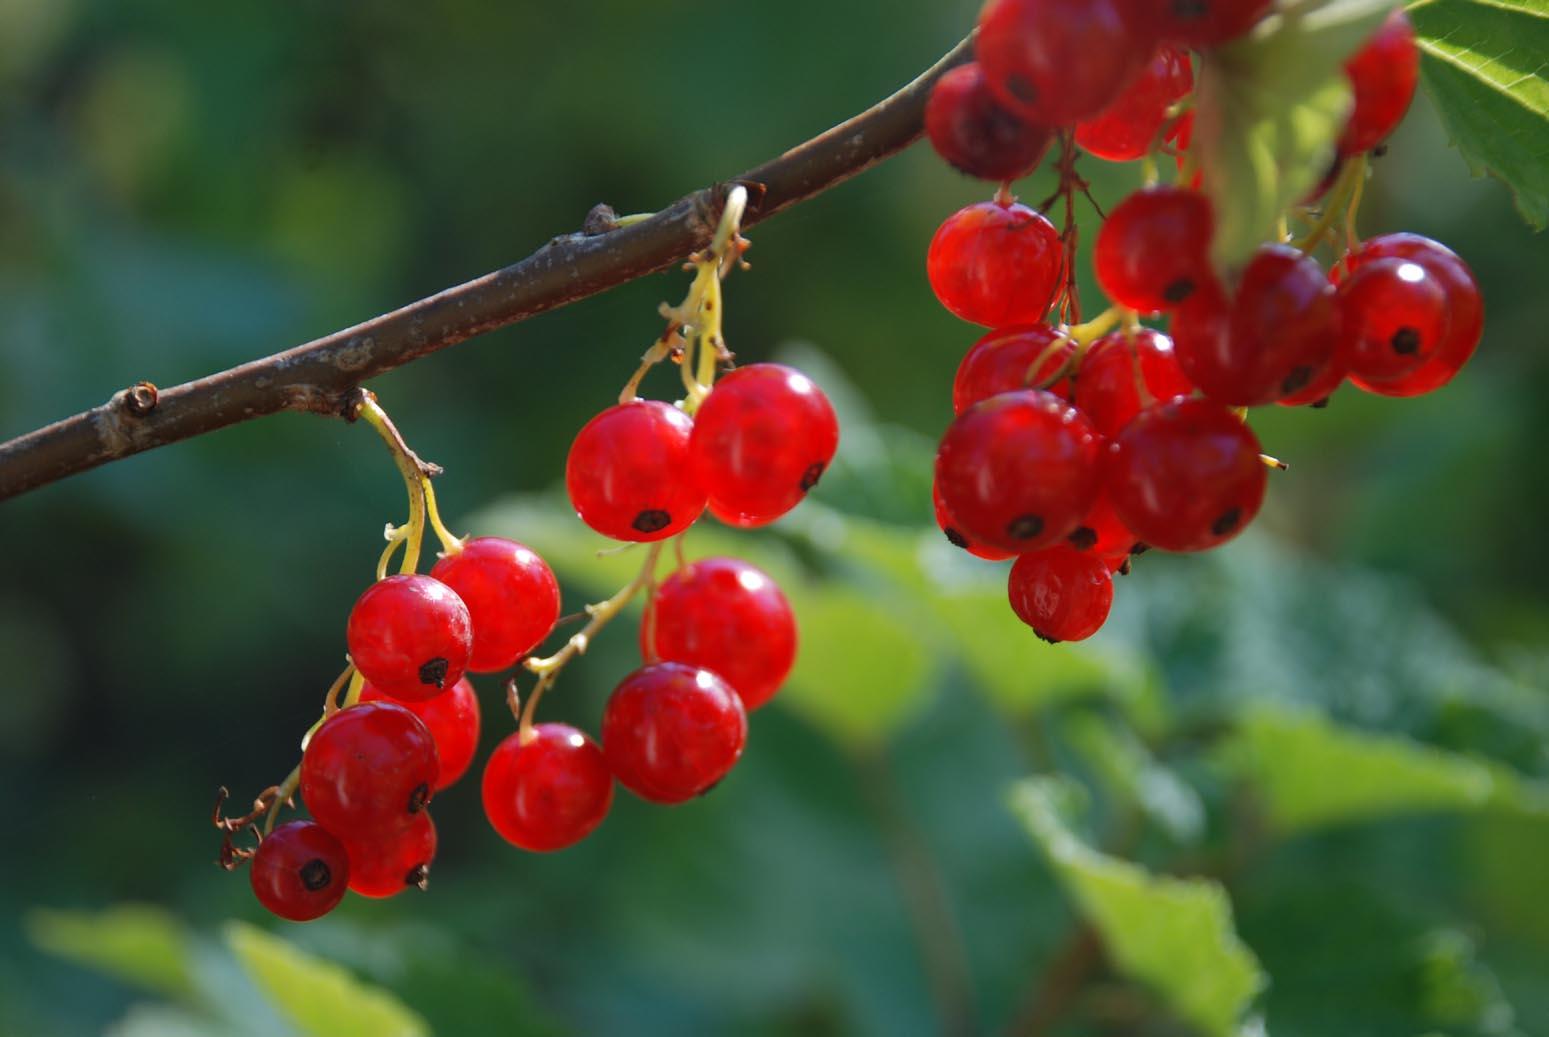 Applegarth Farm: berries in the garden